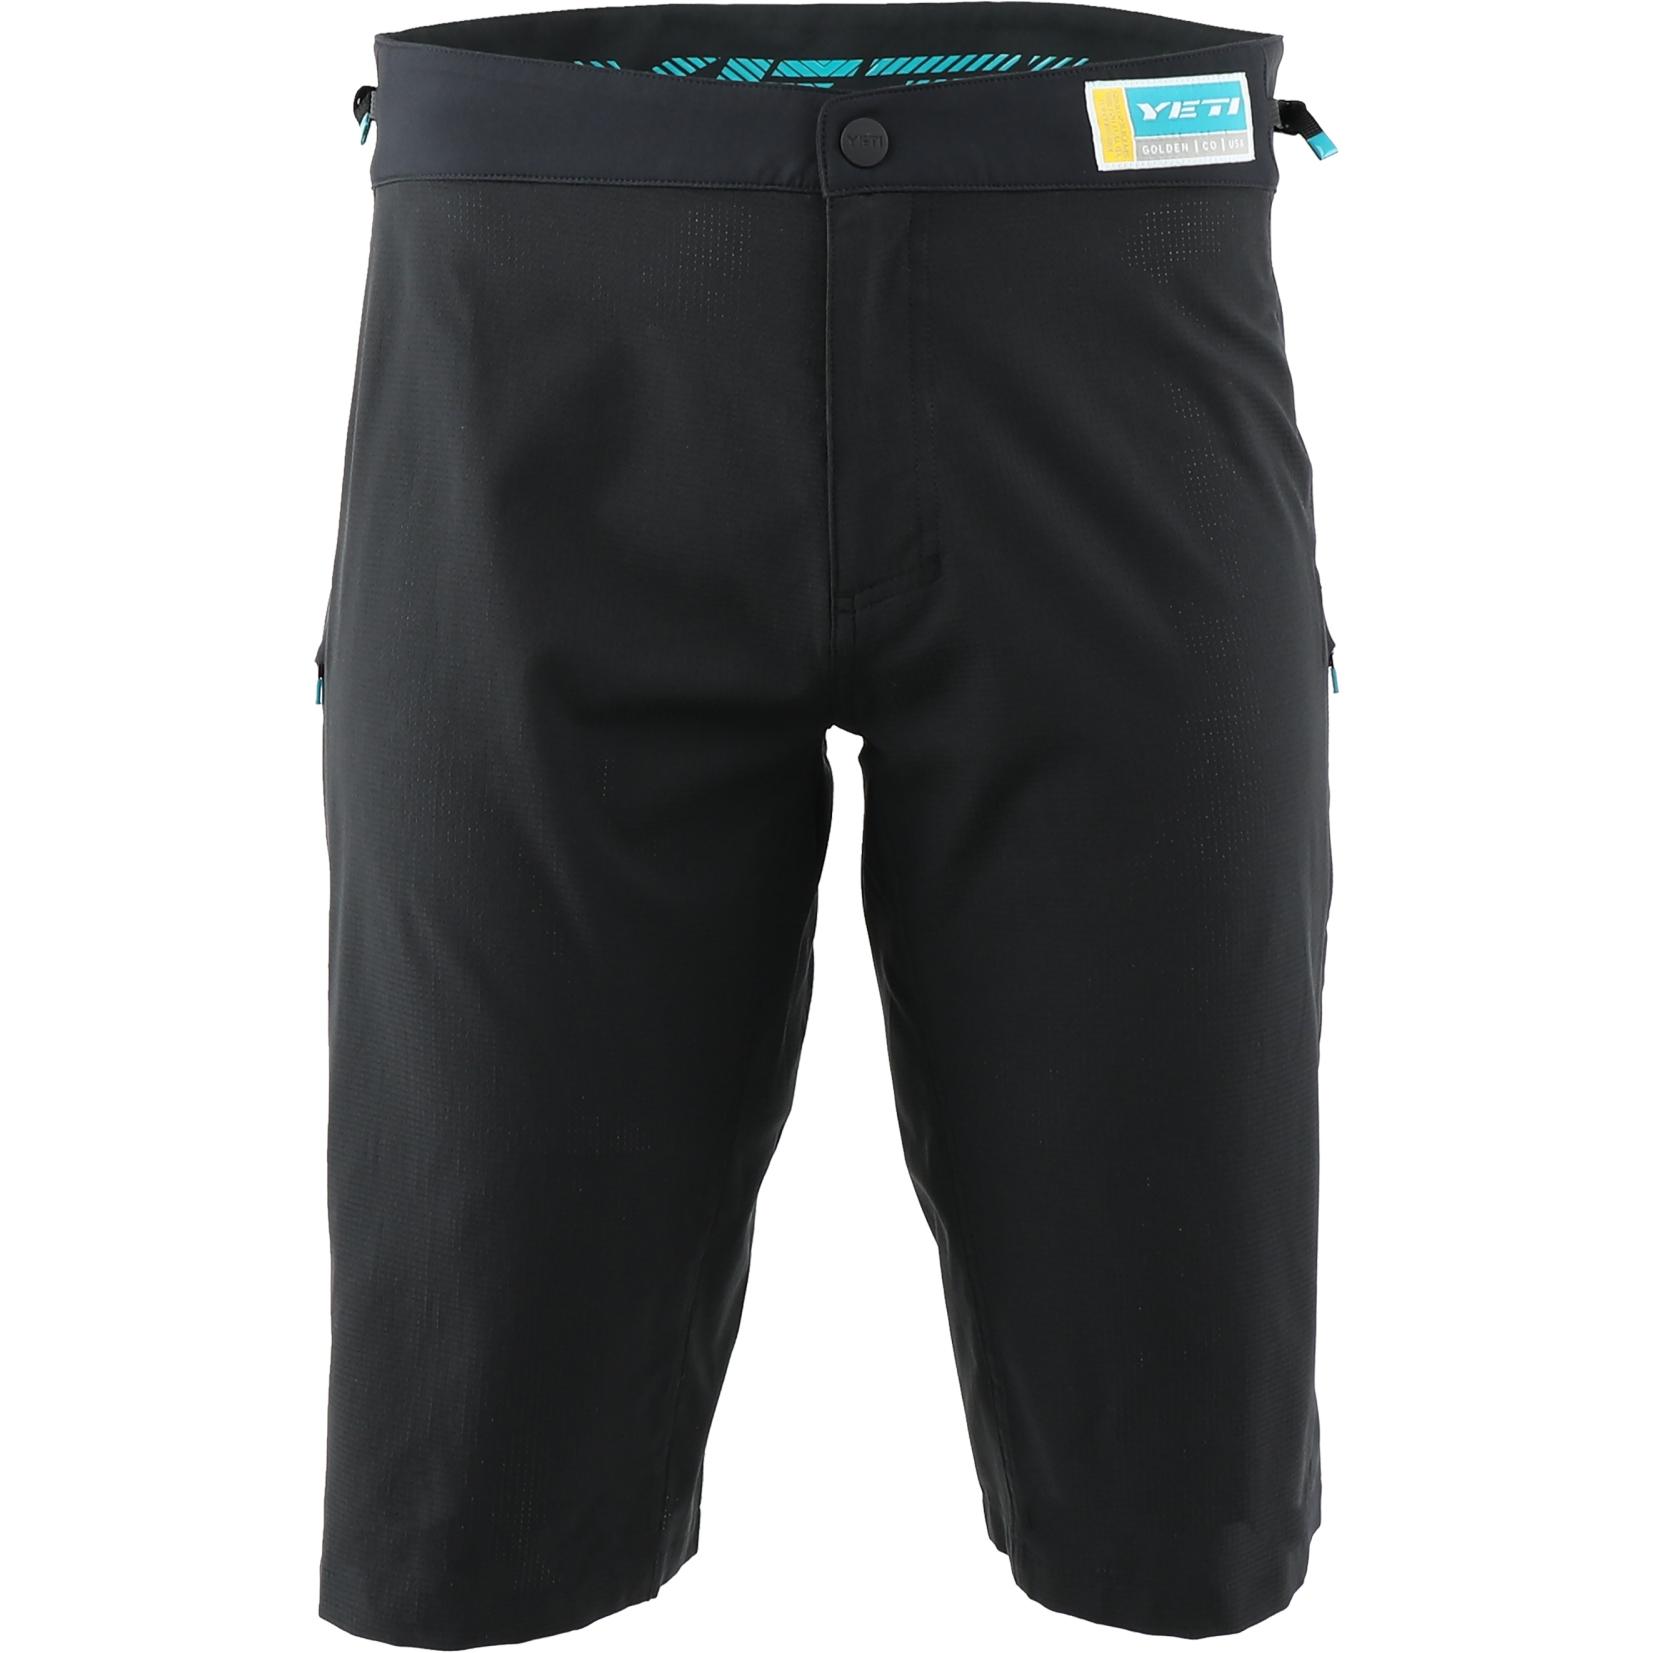 Yeti Cycles Enduro Shorts - Black